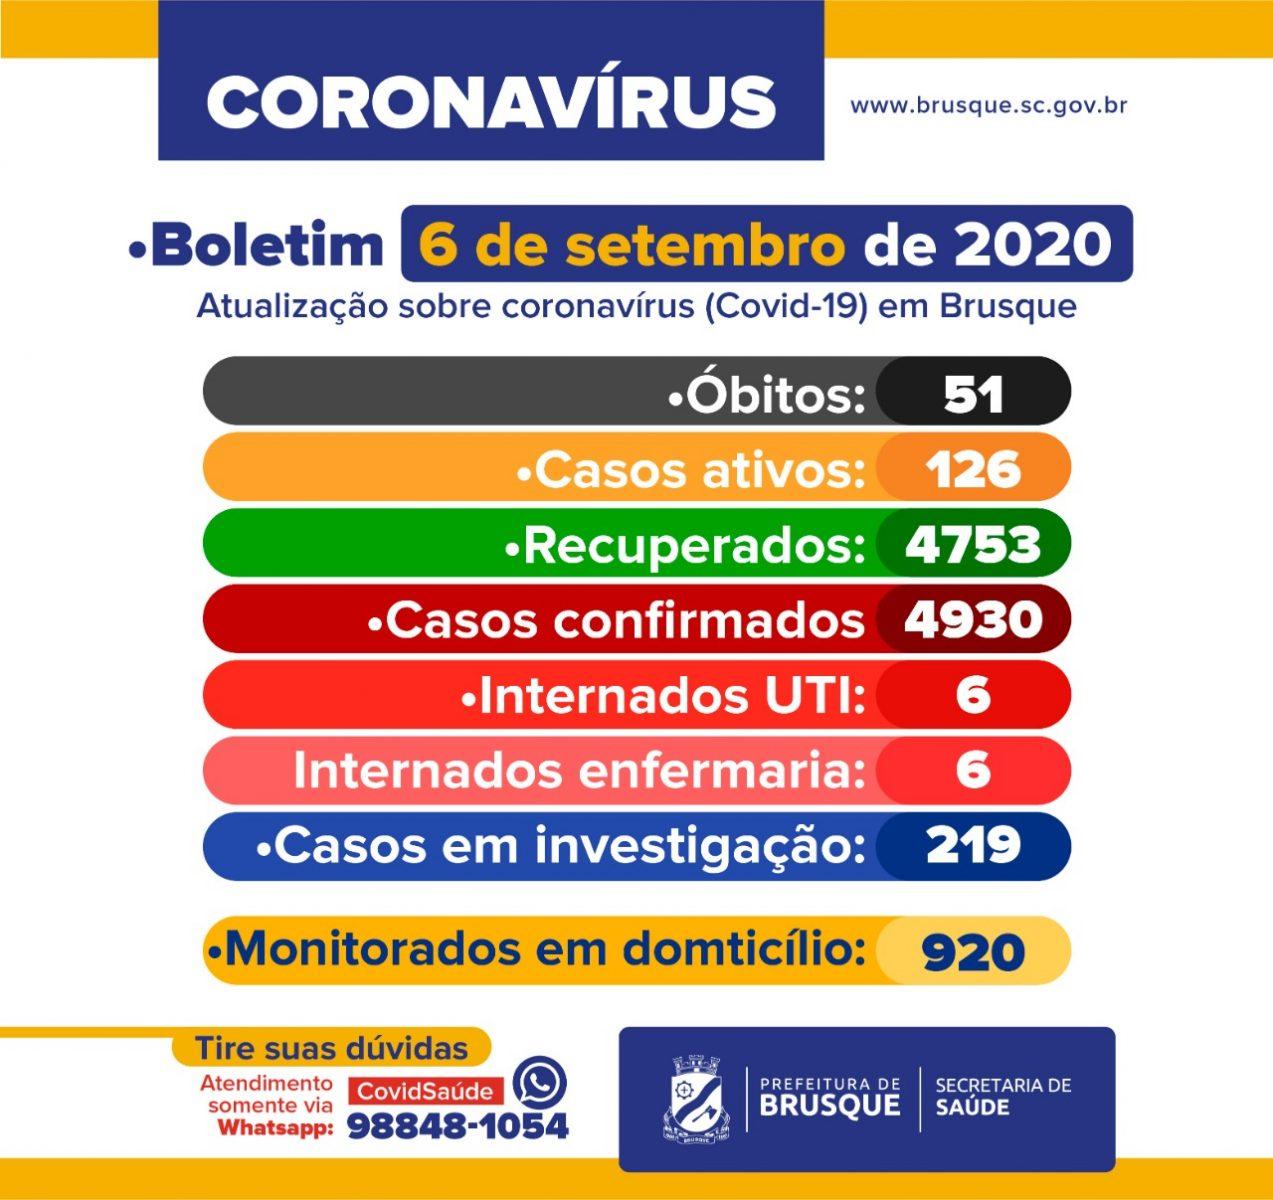 COVID-19: Boletim epidemiológico 6 de setembro